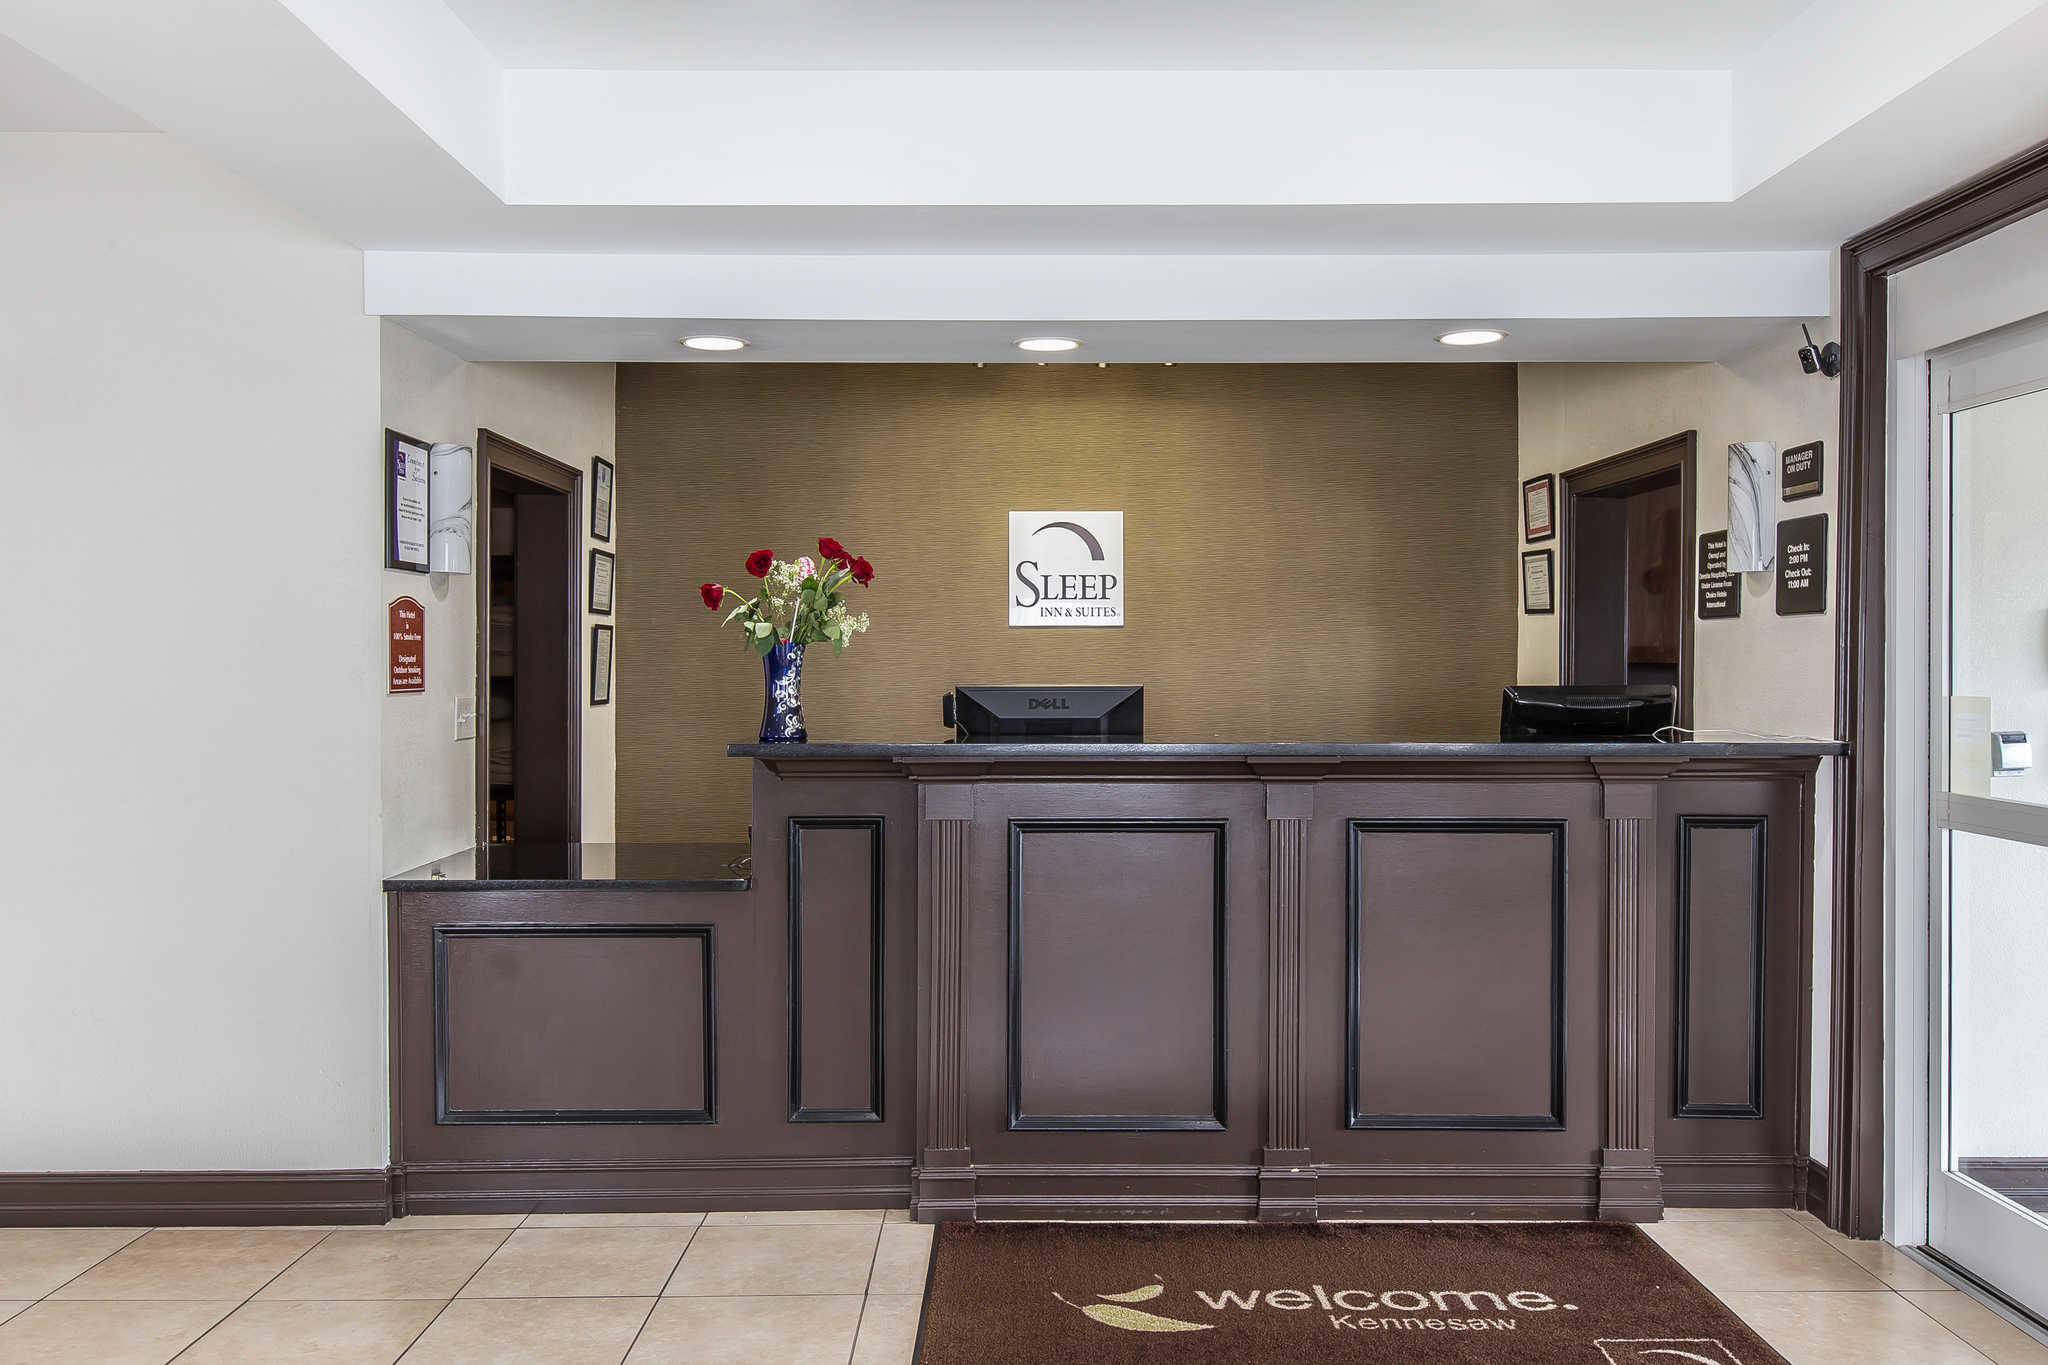 Sleep Inn & Suites At Kennesaw State University image 3